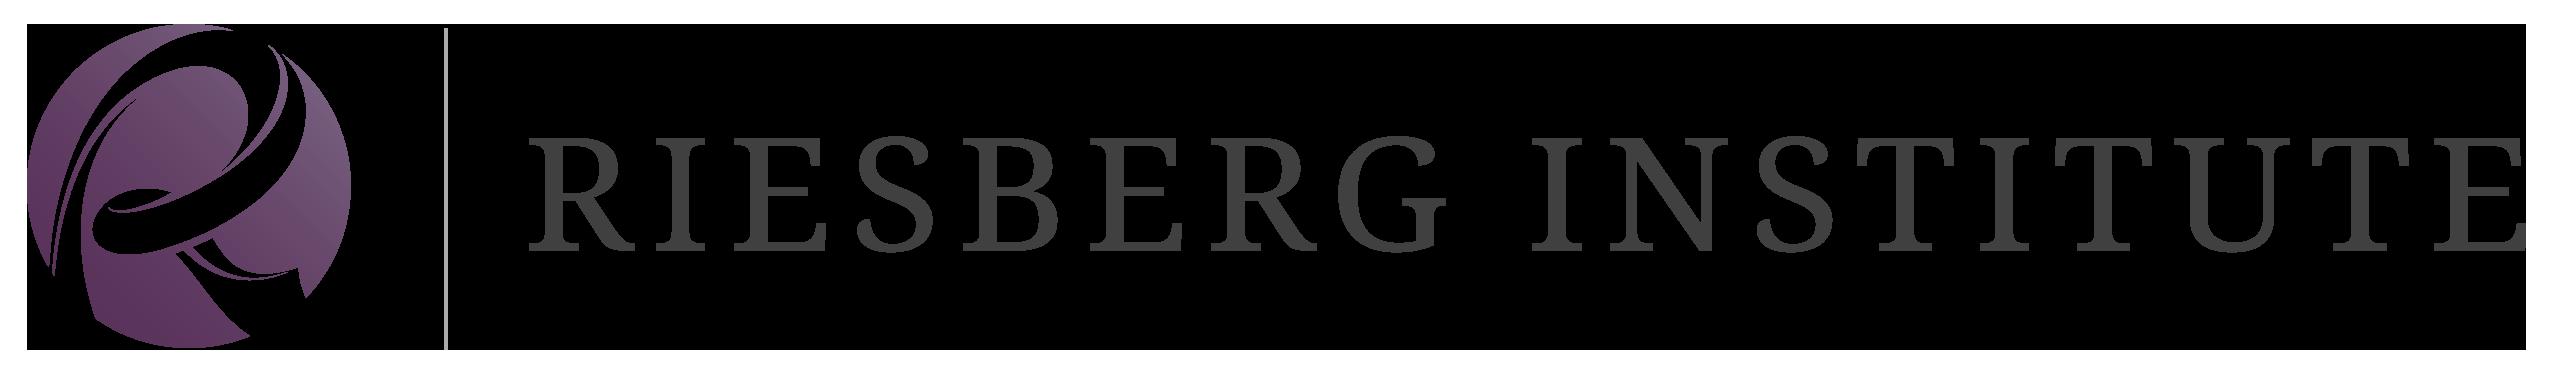 Riesberg Institute logo